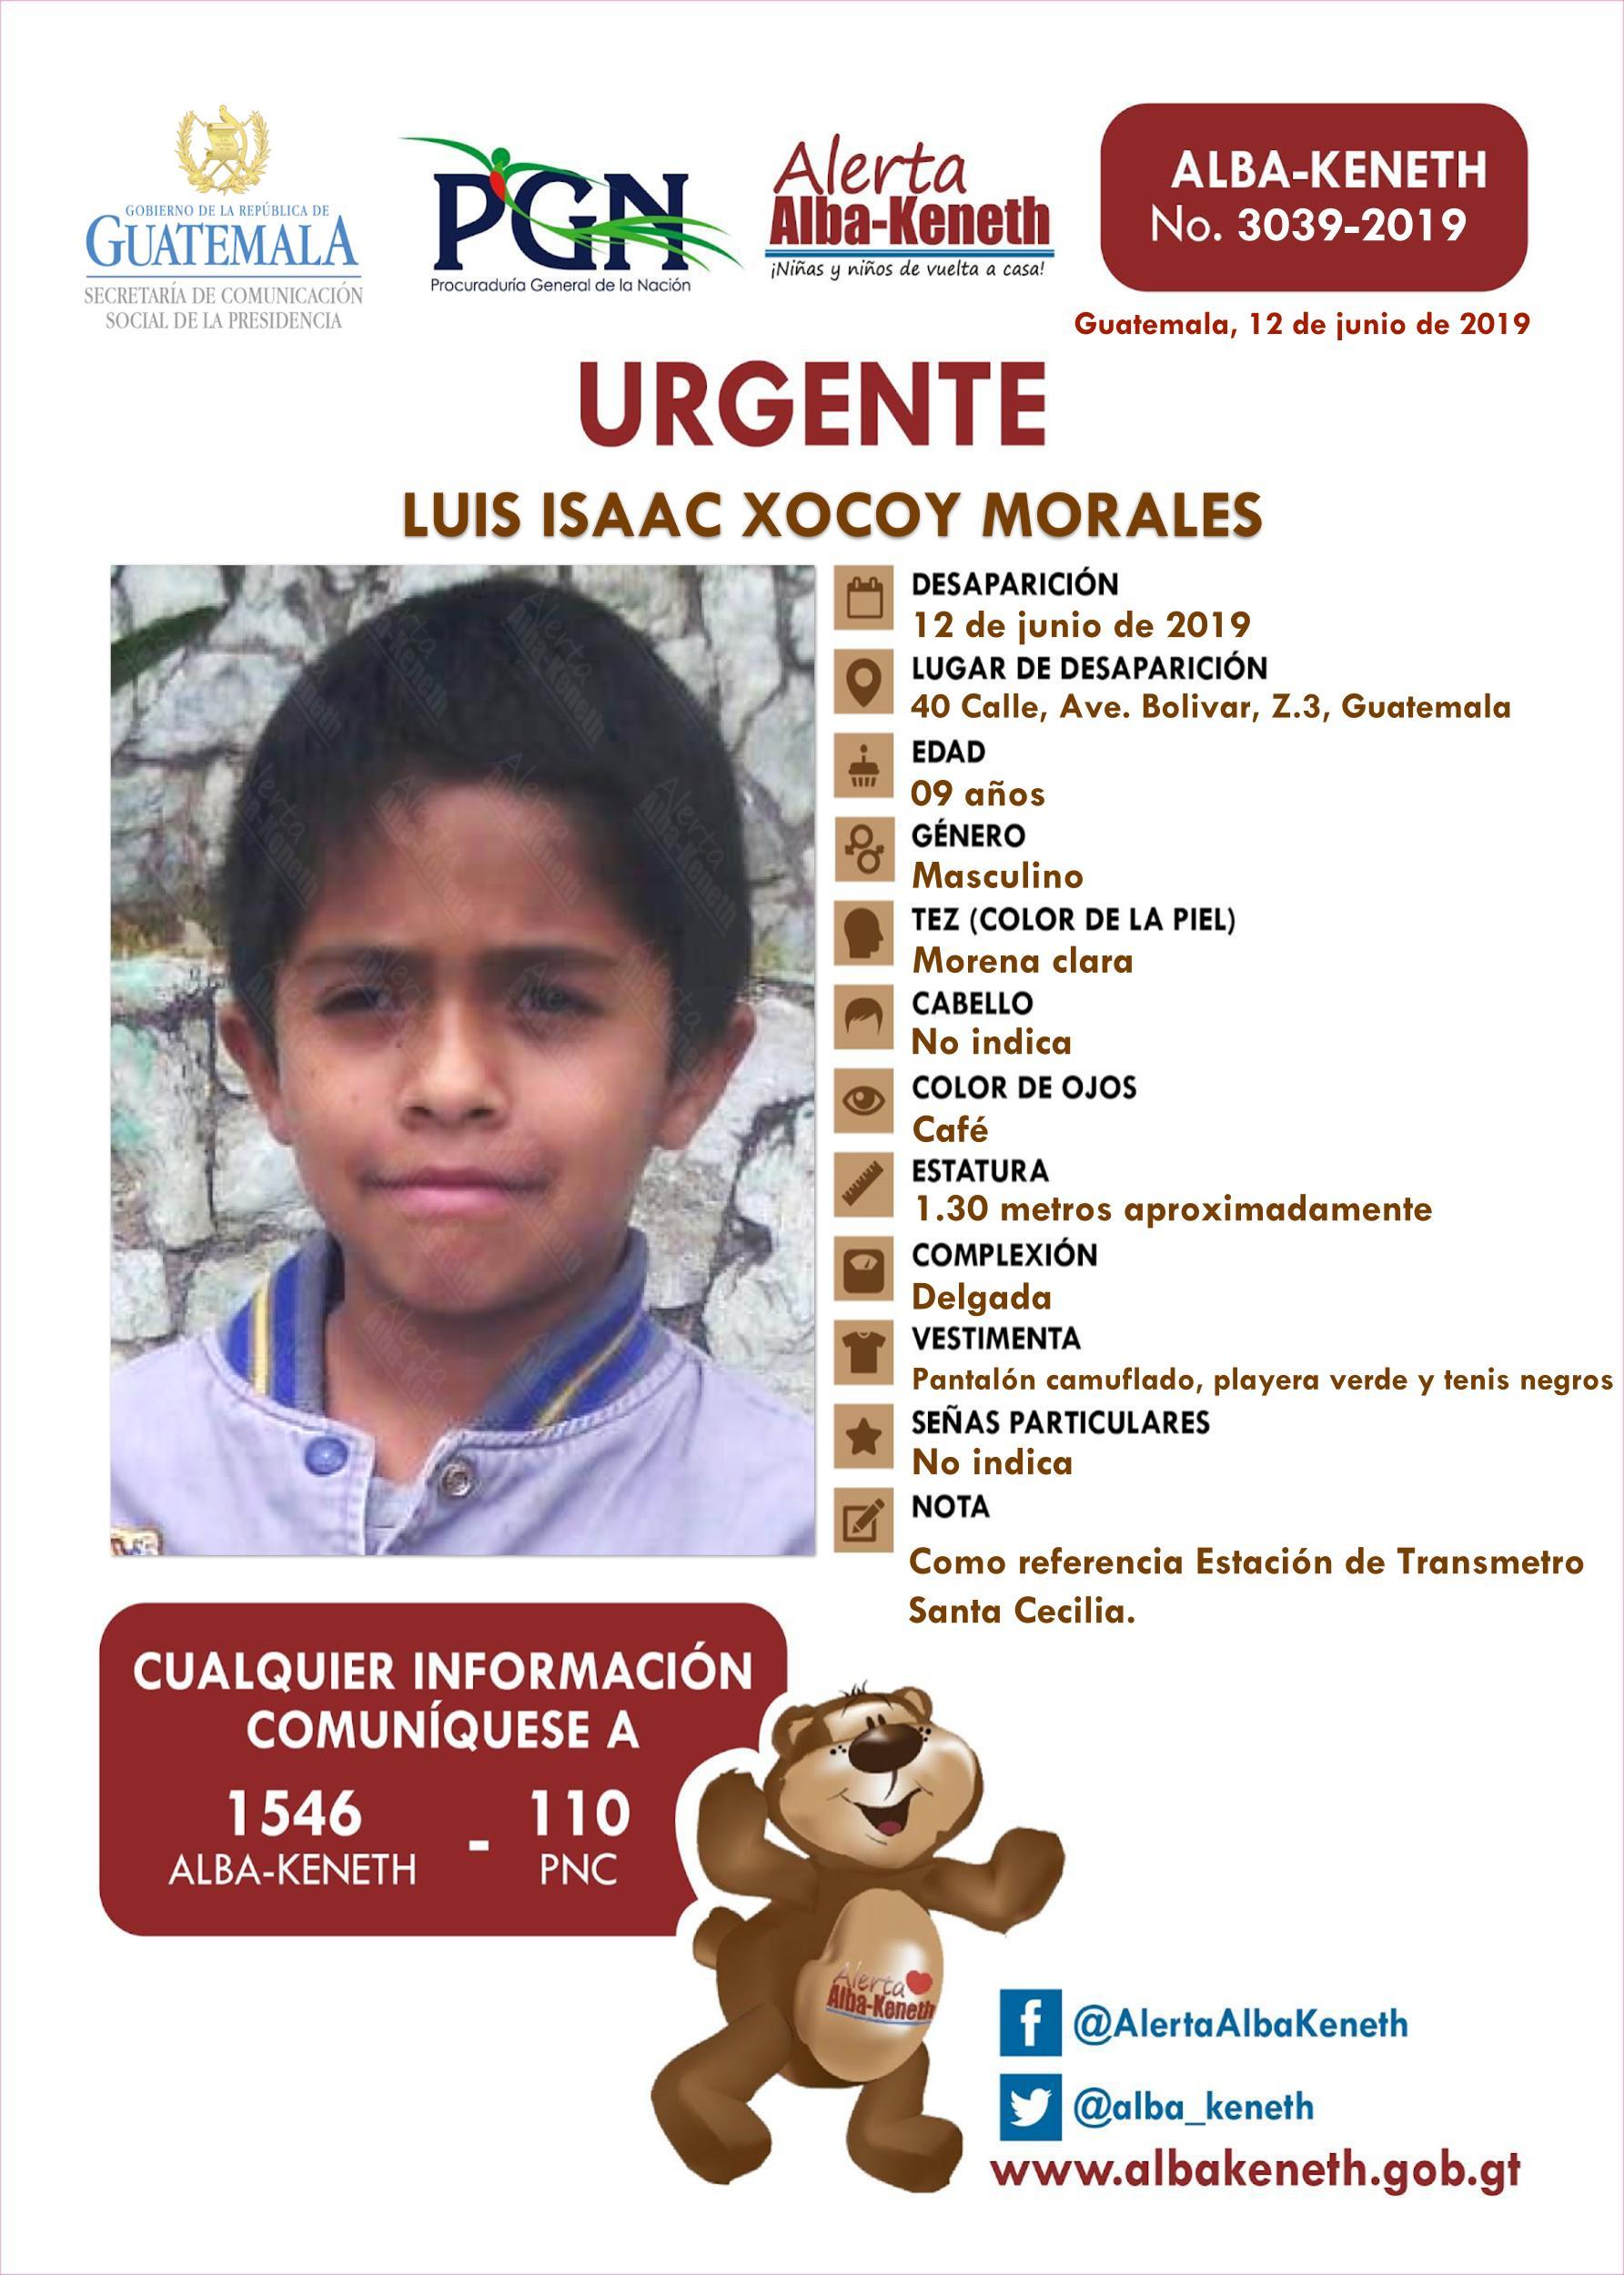 Luis Usaa Xocoy Morales